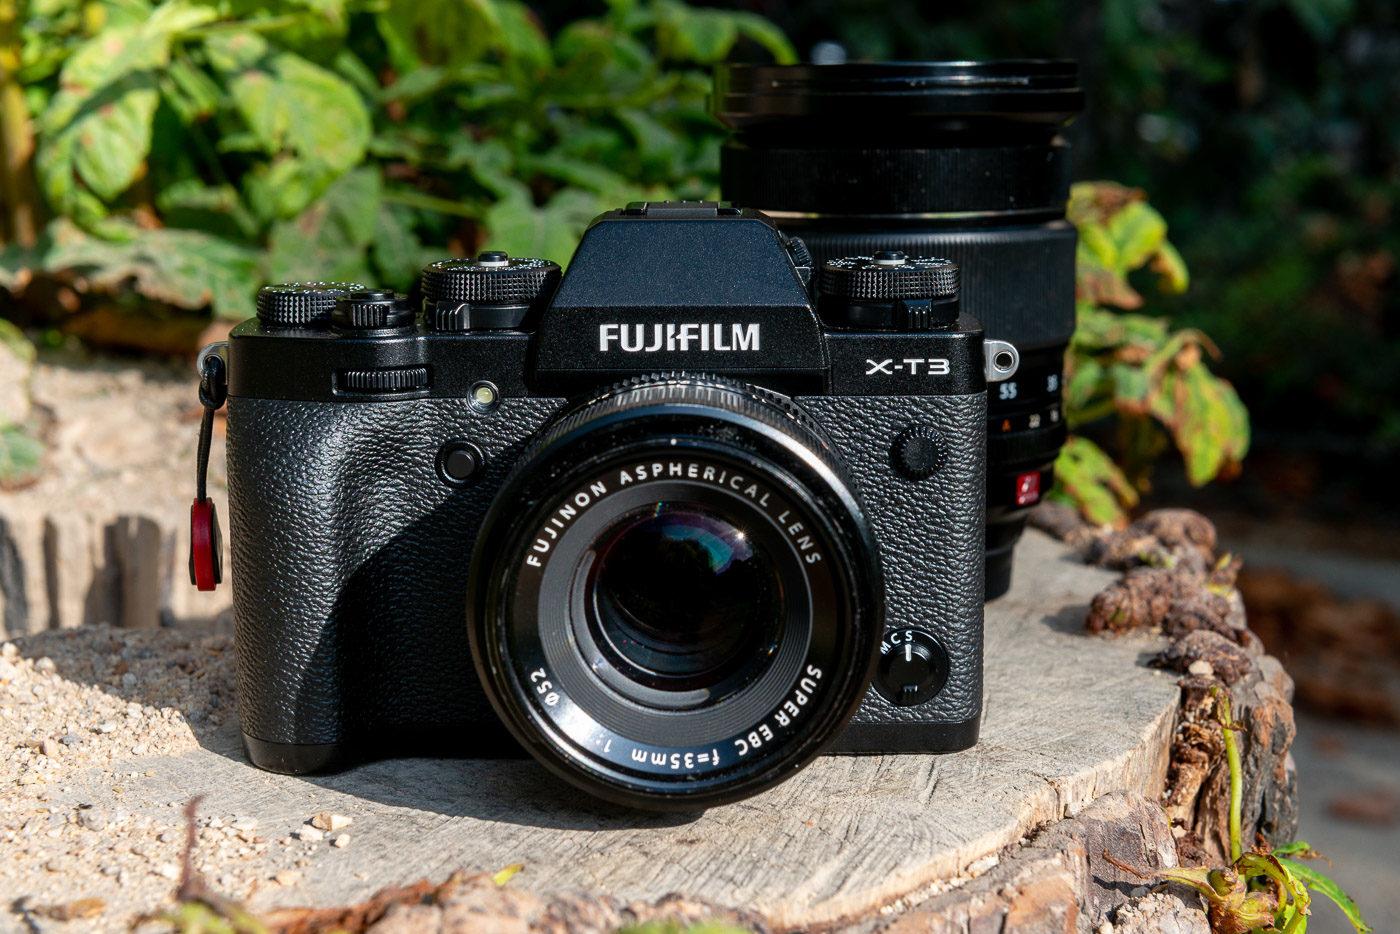 Test du Fuji X-T3, l'hybride APS-C phare de Fujifilm